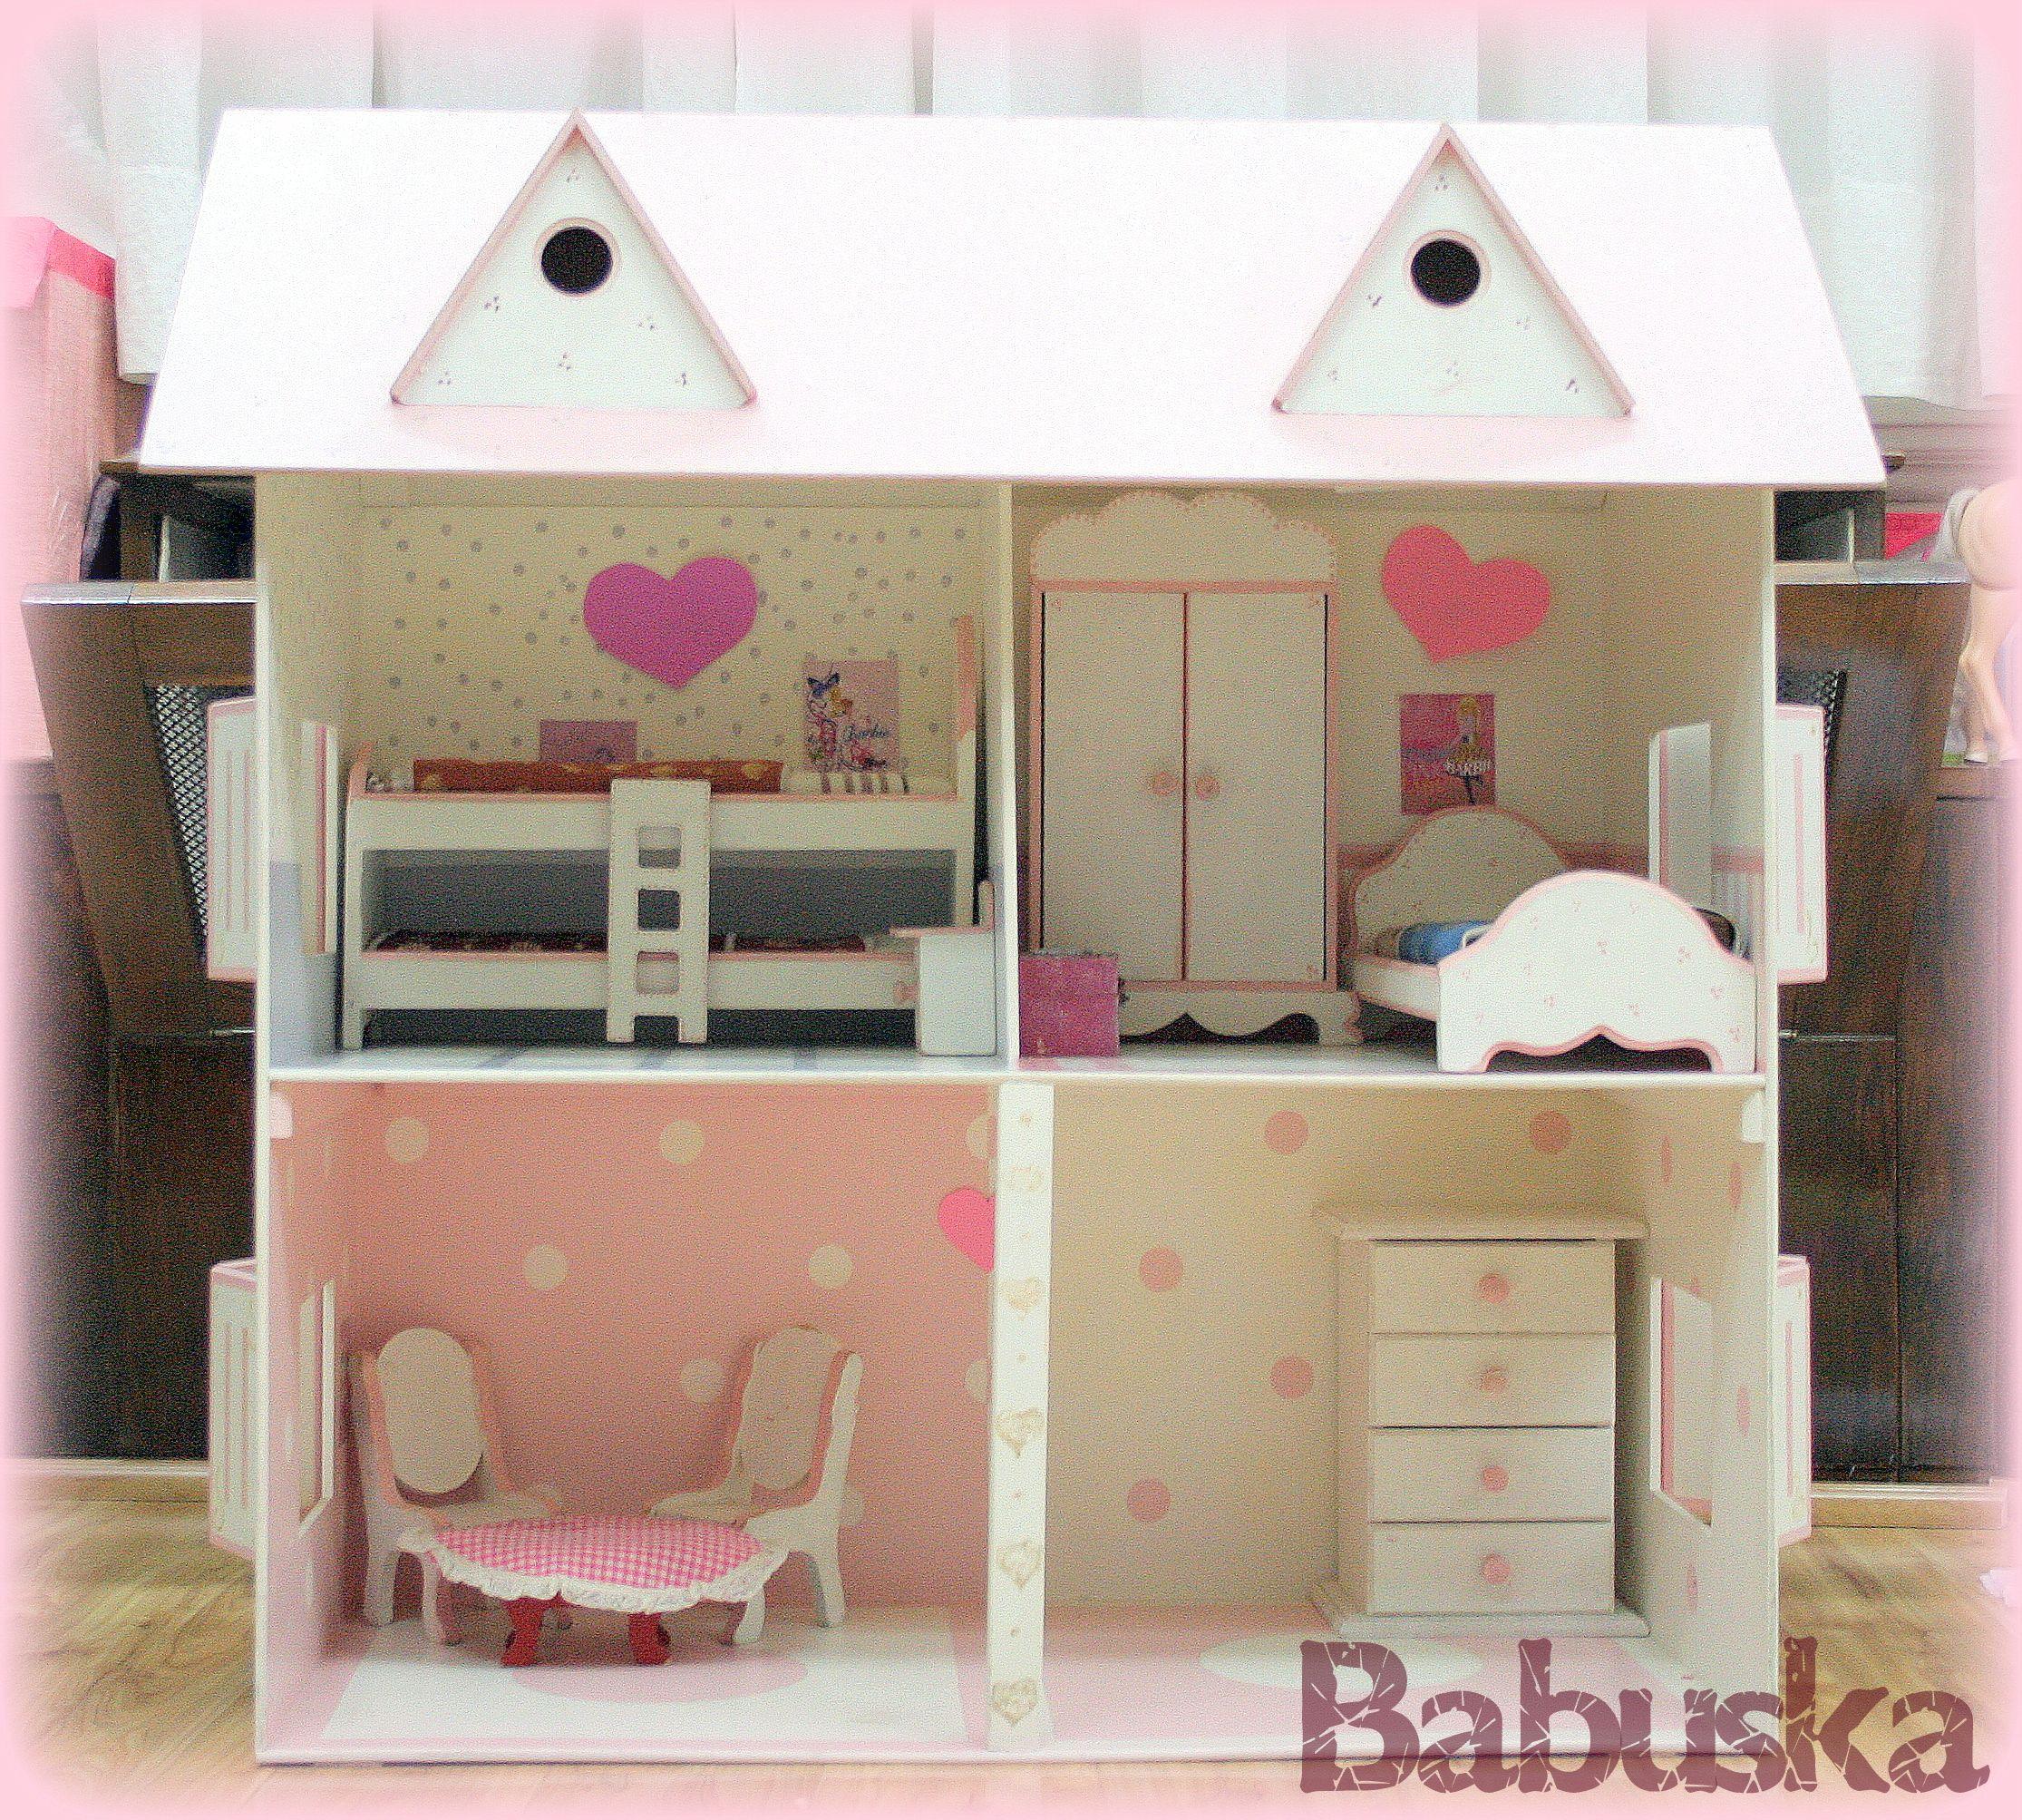 Casa de barbie en madera pintada decorada y laqueada a - Casas de madera pintadas ...